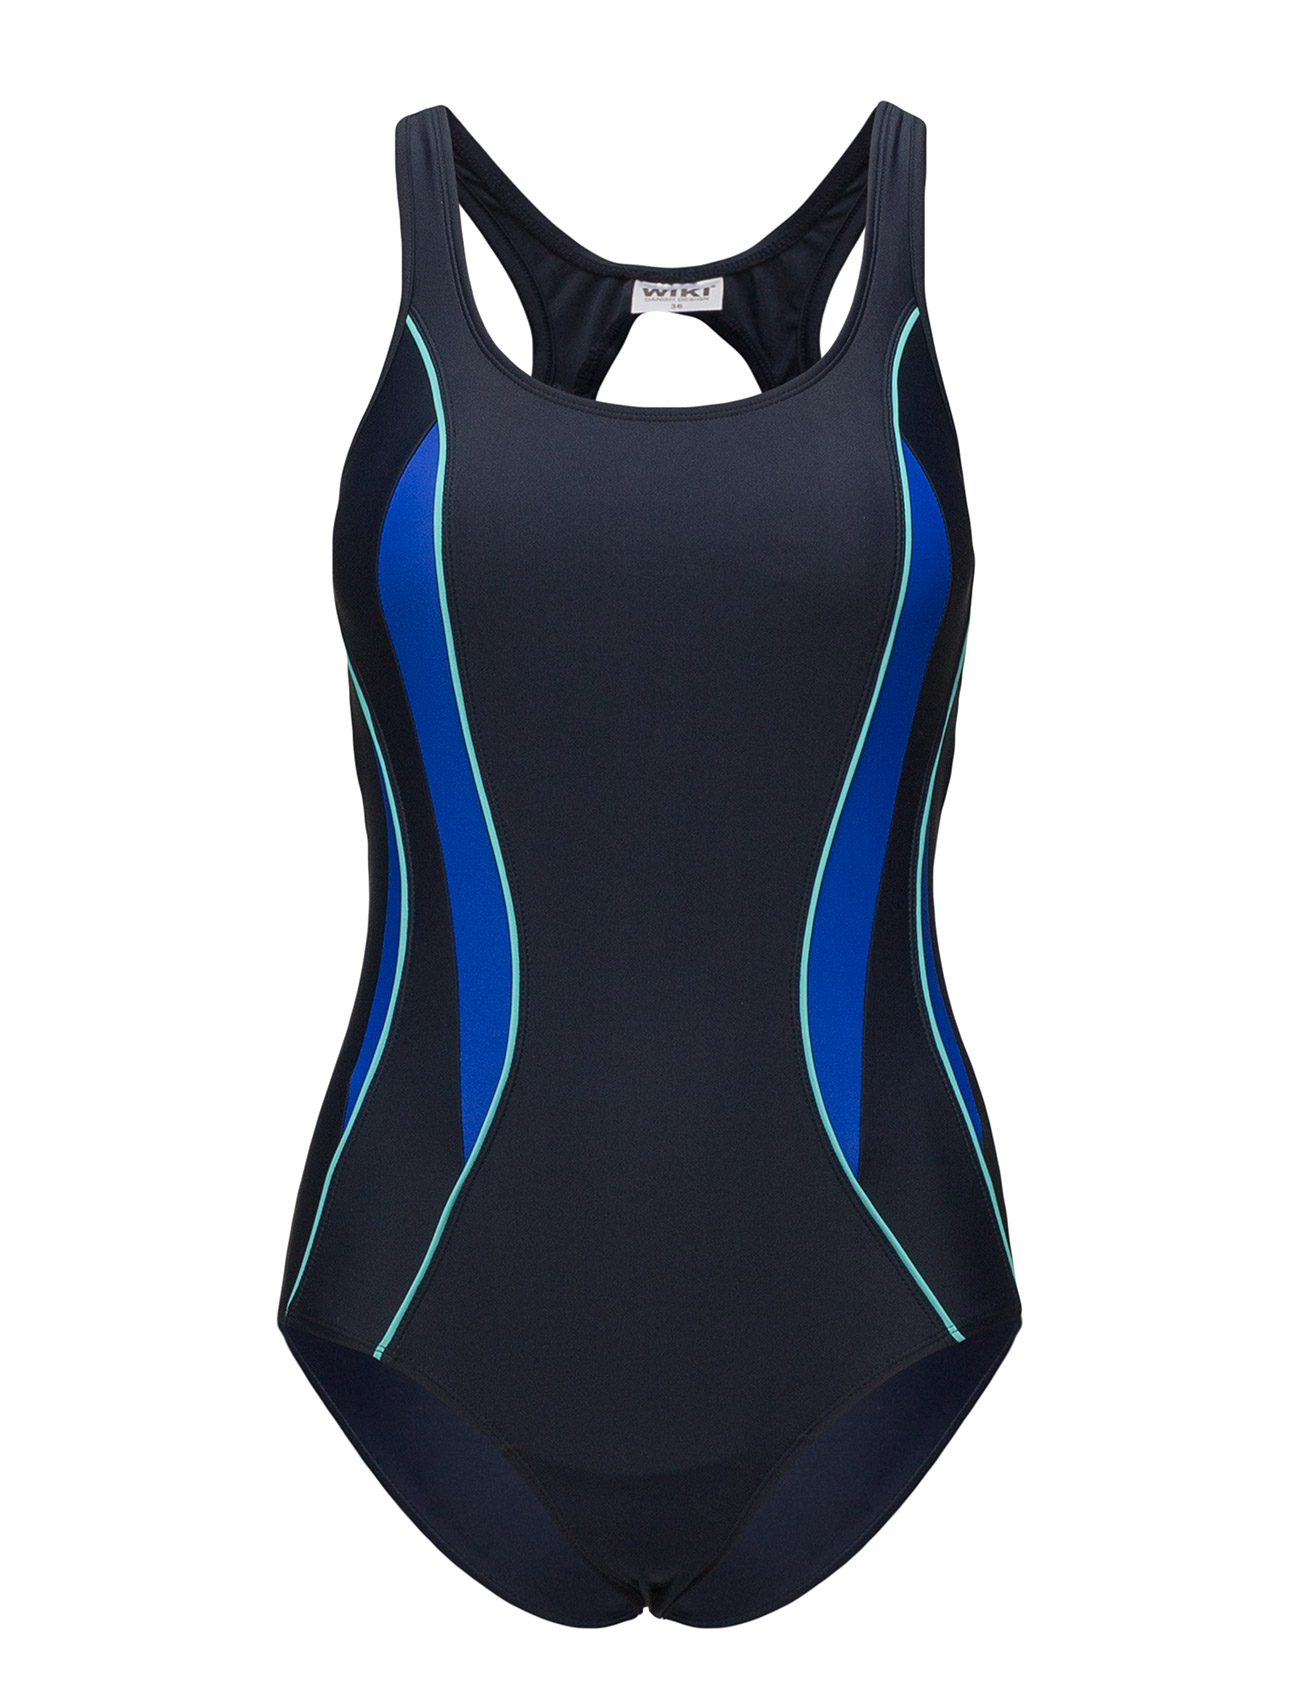 b32ecdcc5f3 Swimsuit Alba Sport Badedragt Badetøj Blå WIKI